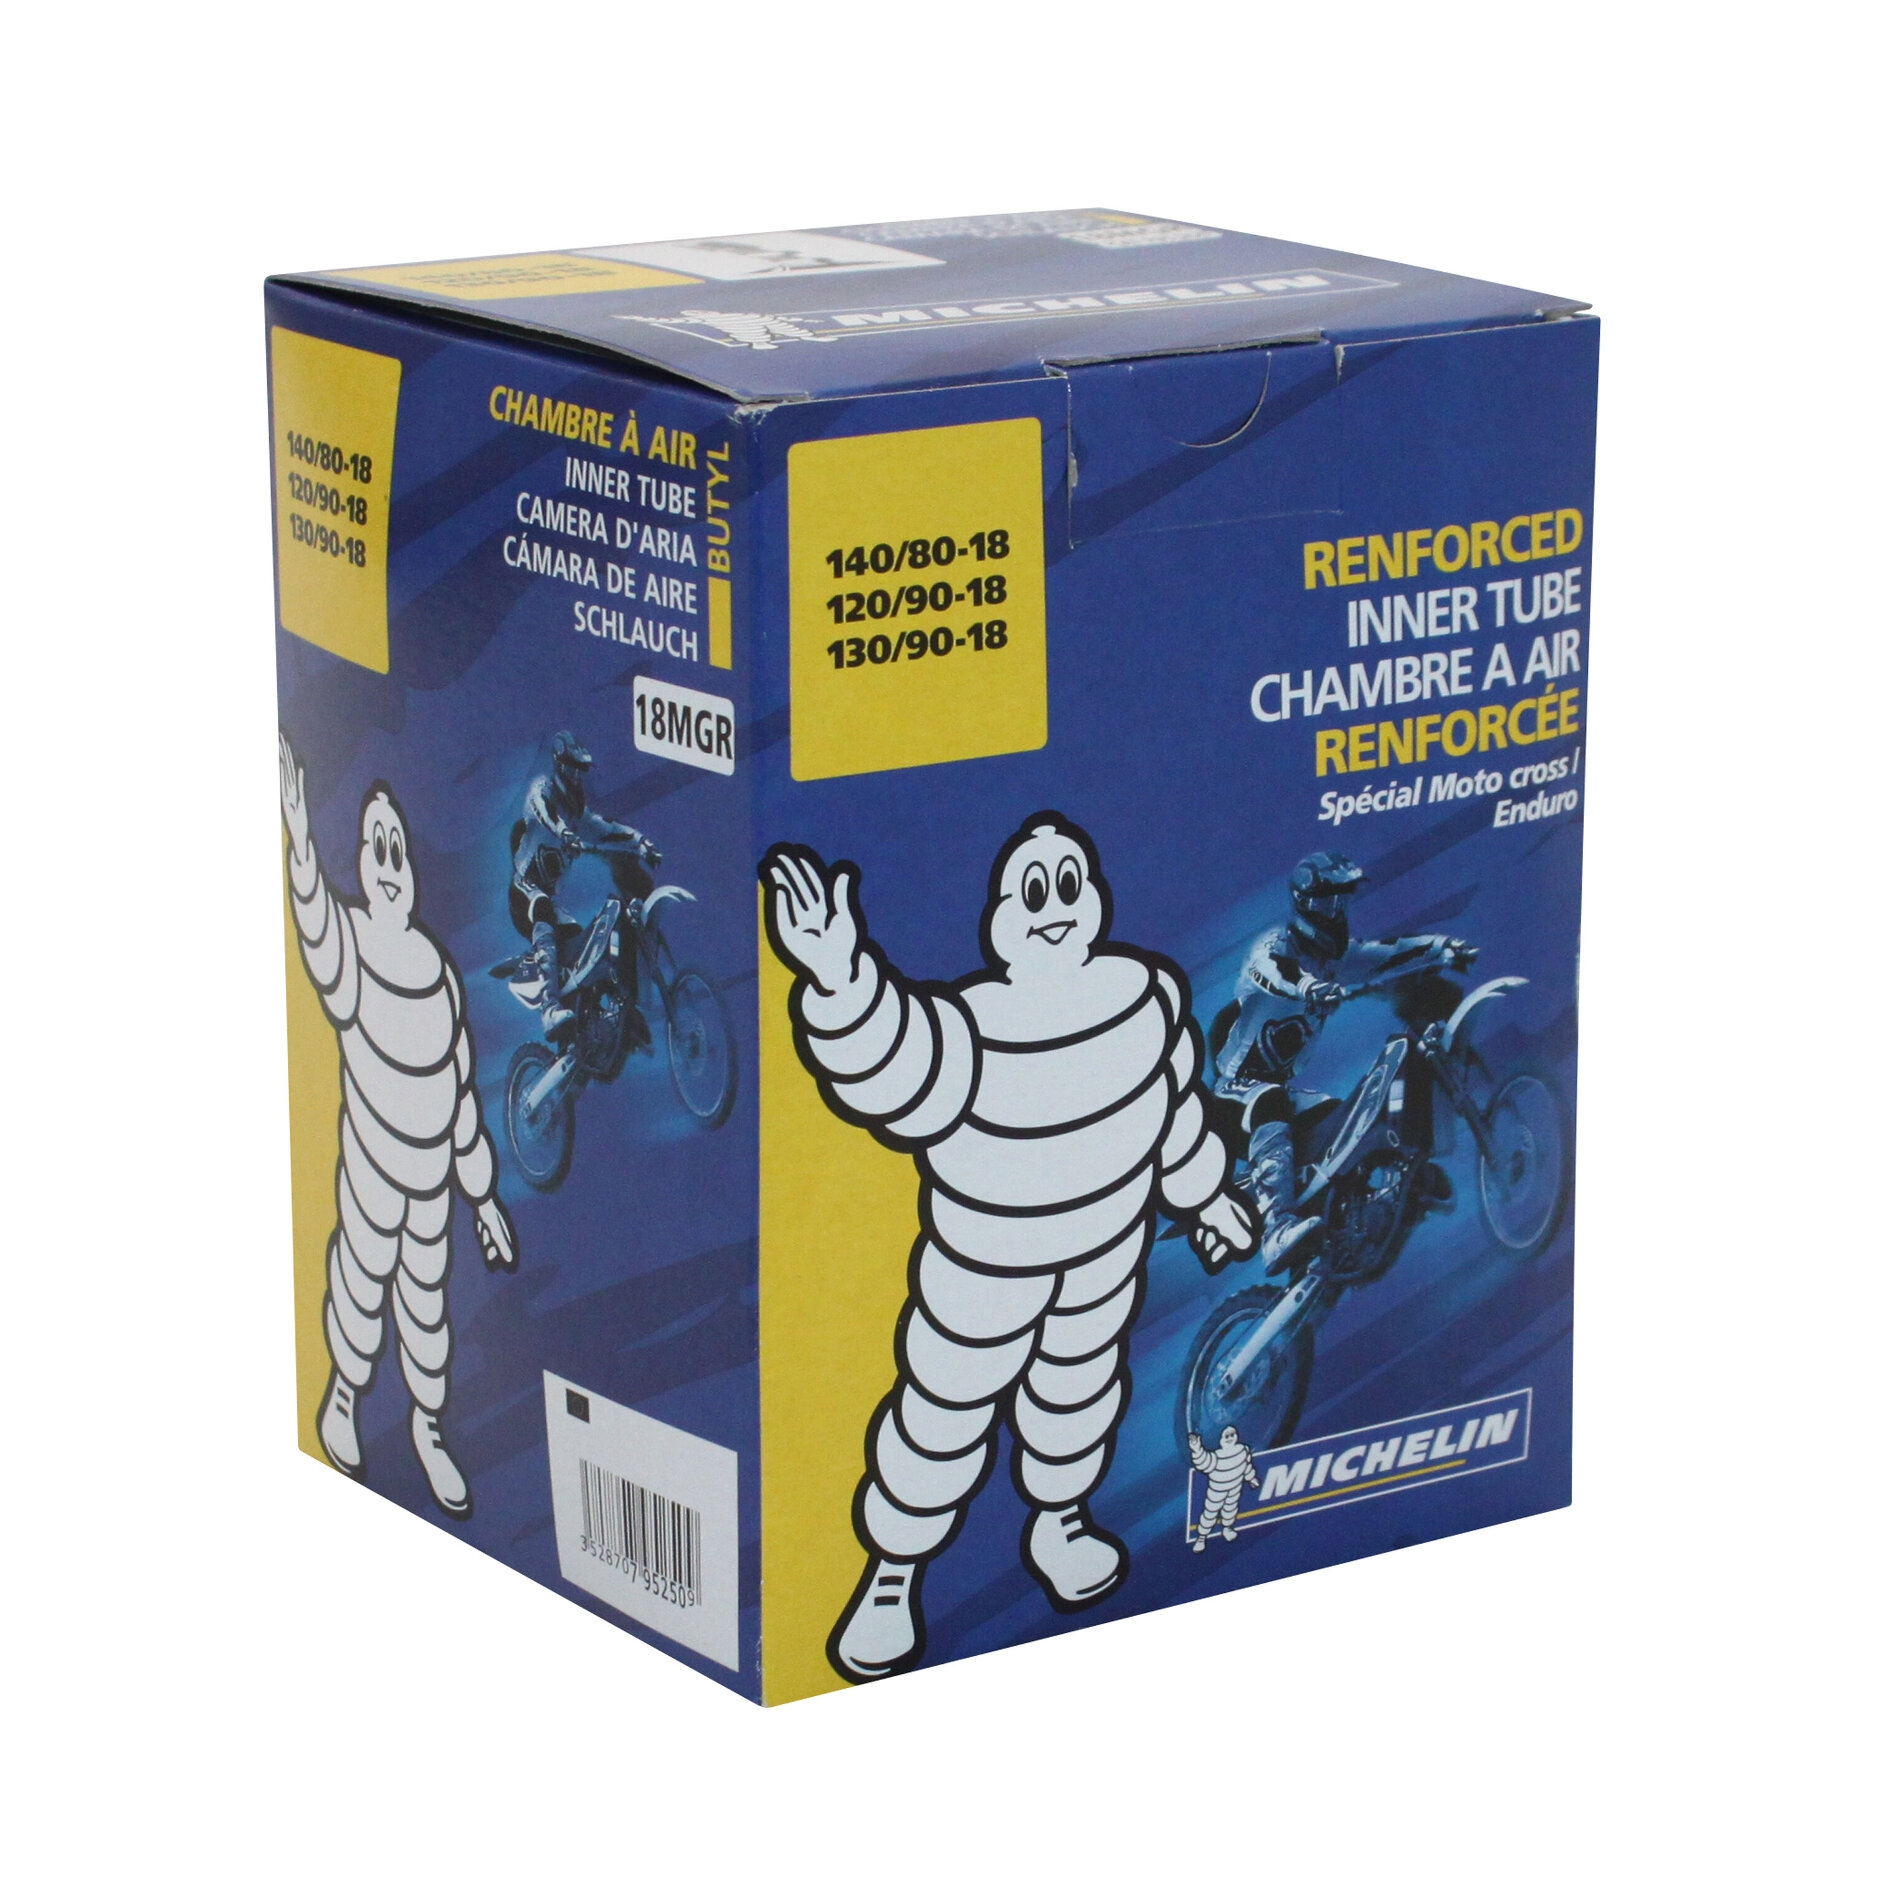 Chambre à air Michelin offroad 140/80-18 valve droite